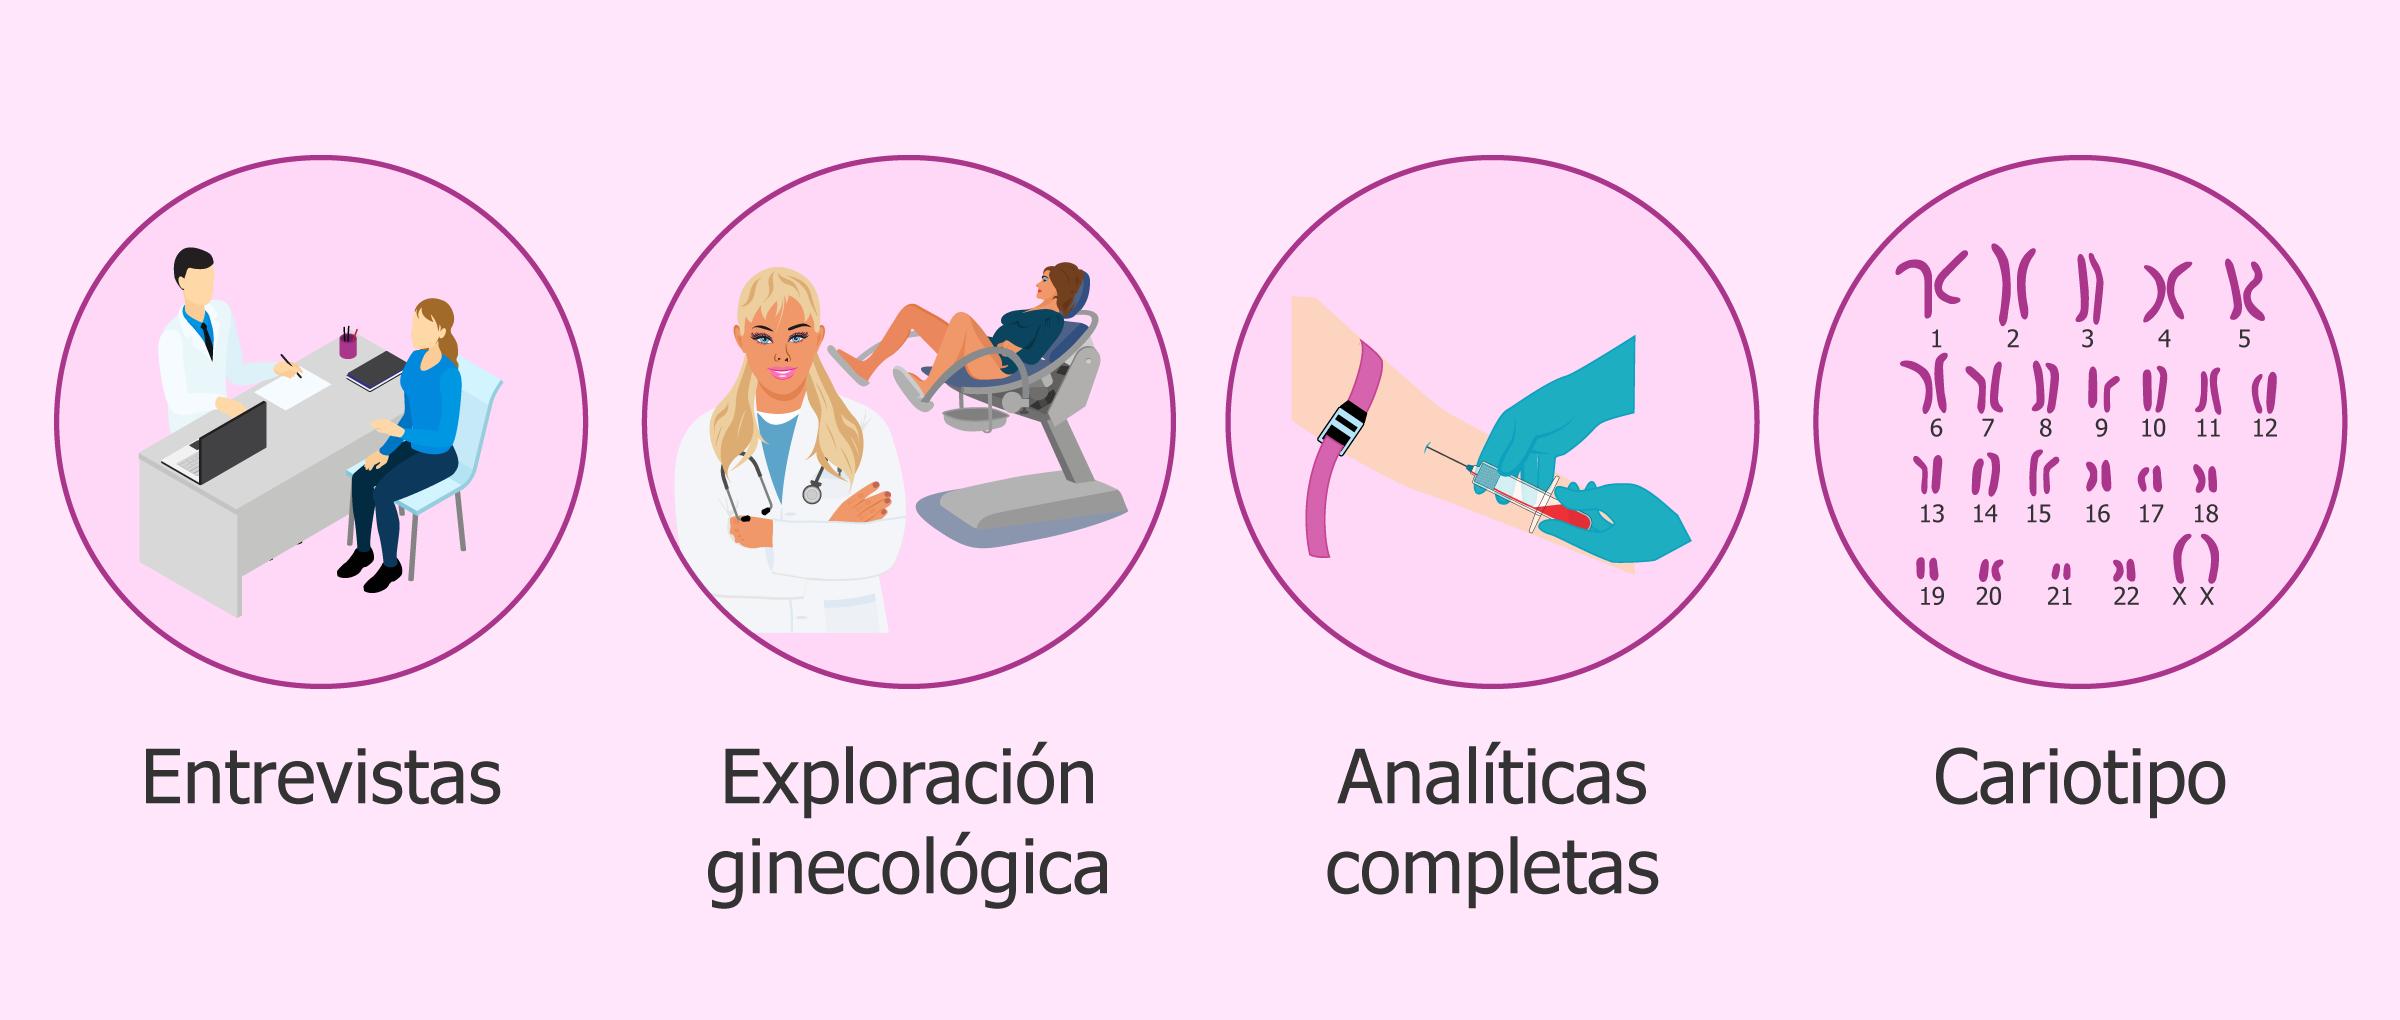 Requisitos médicos para ser donante de óvulos